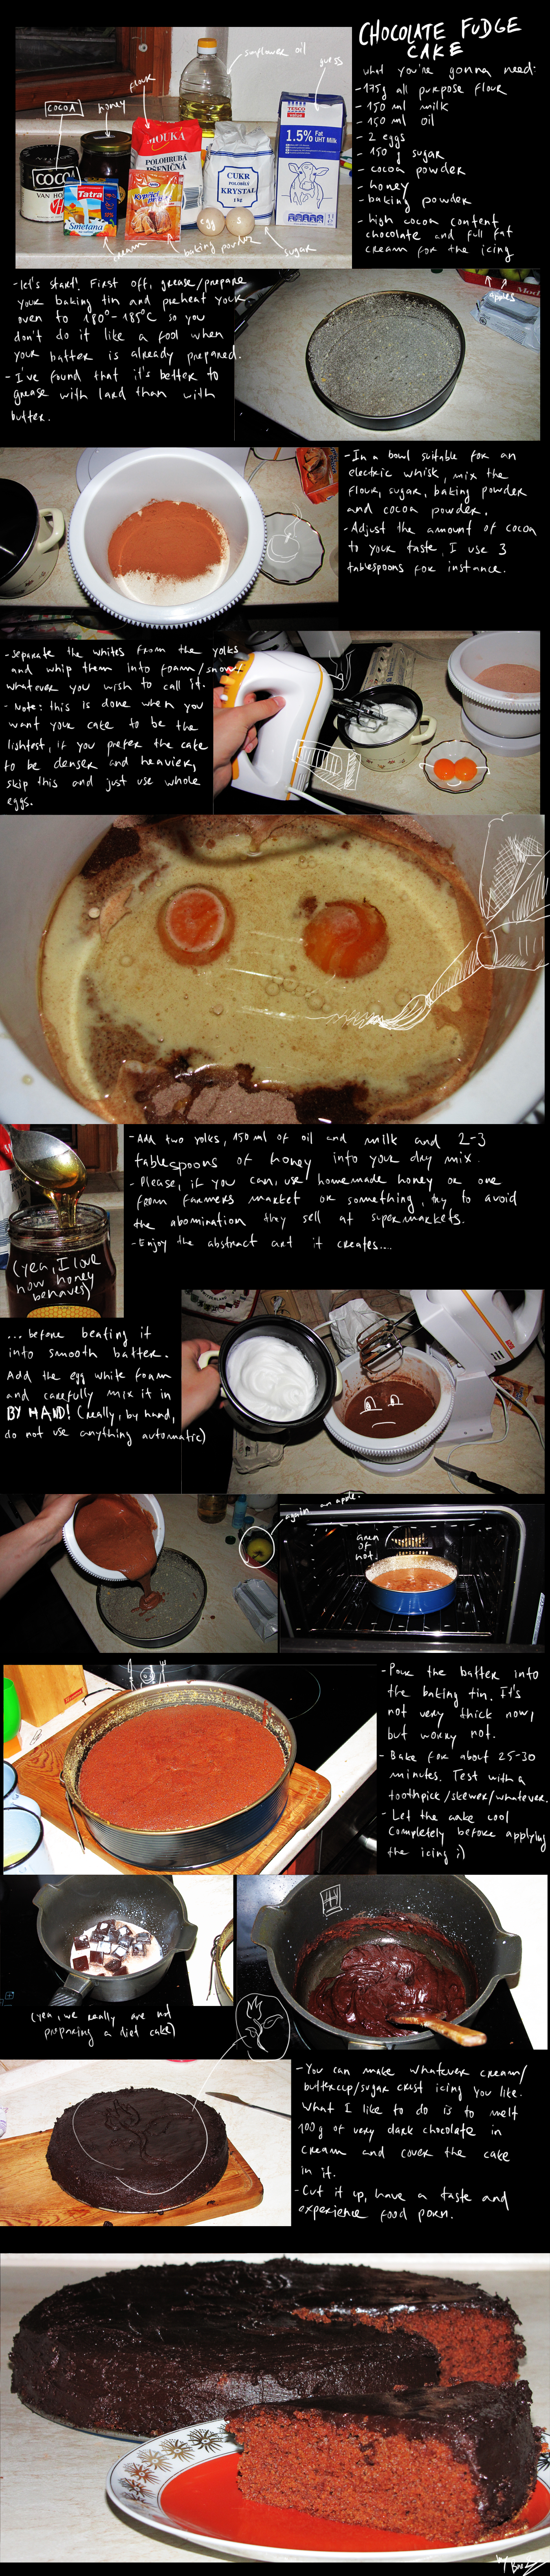 How to make chocolate fudge cake by BrocX